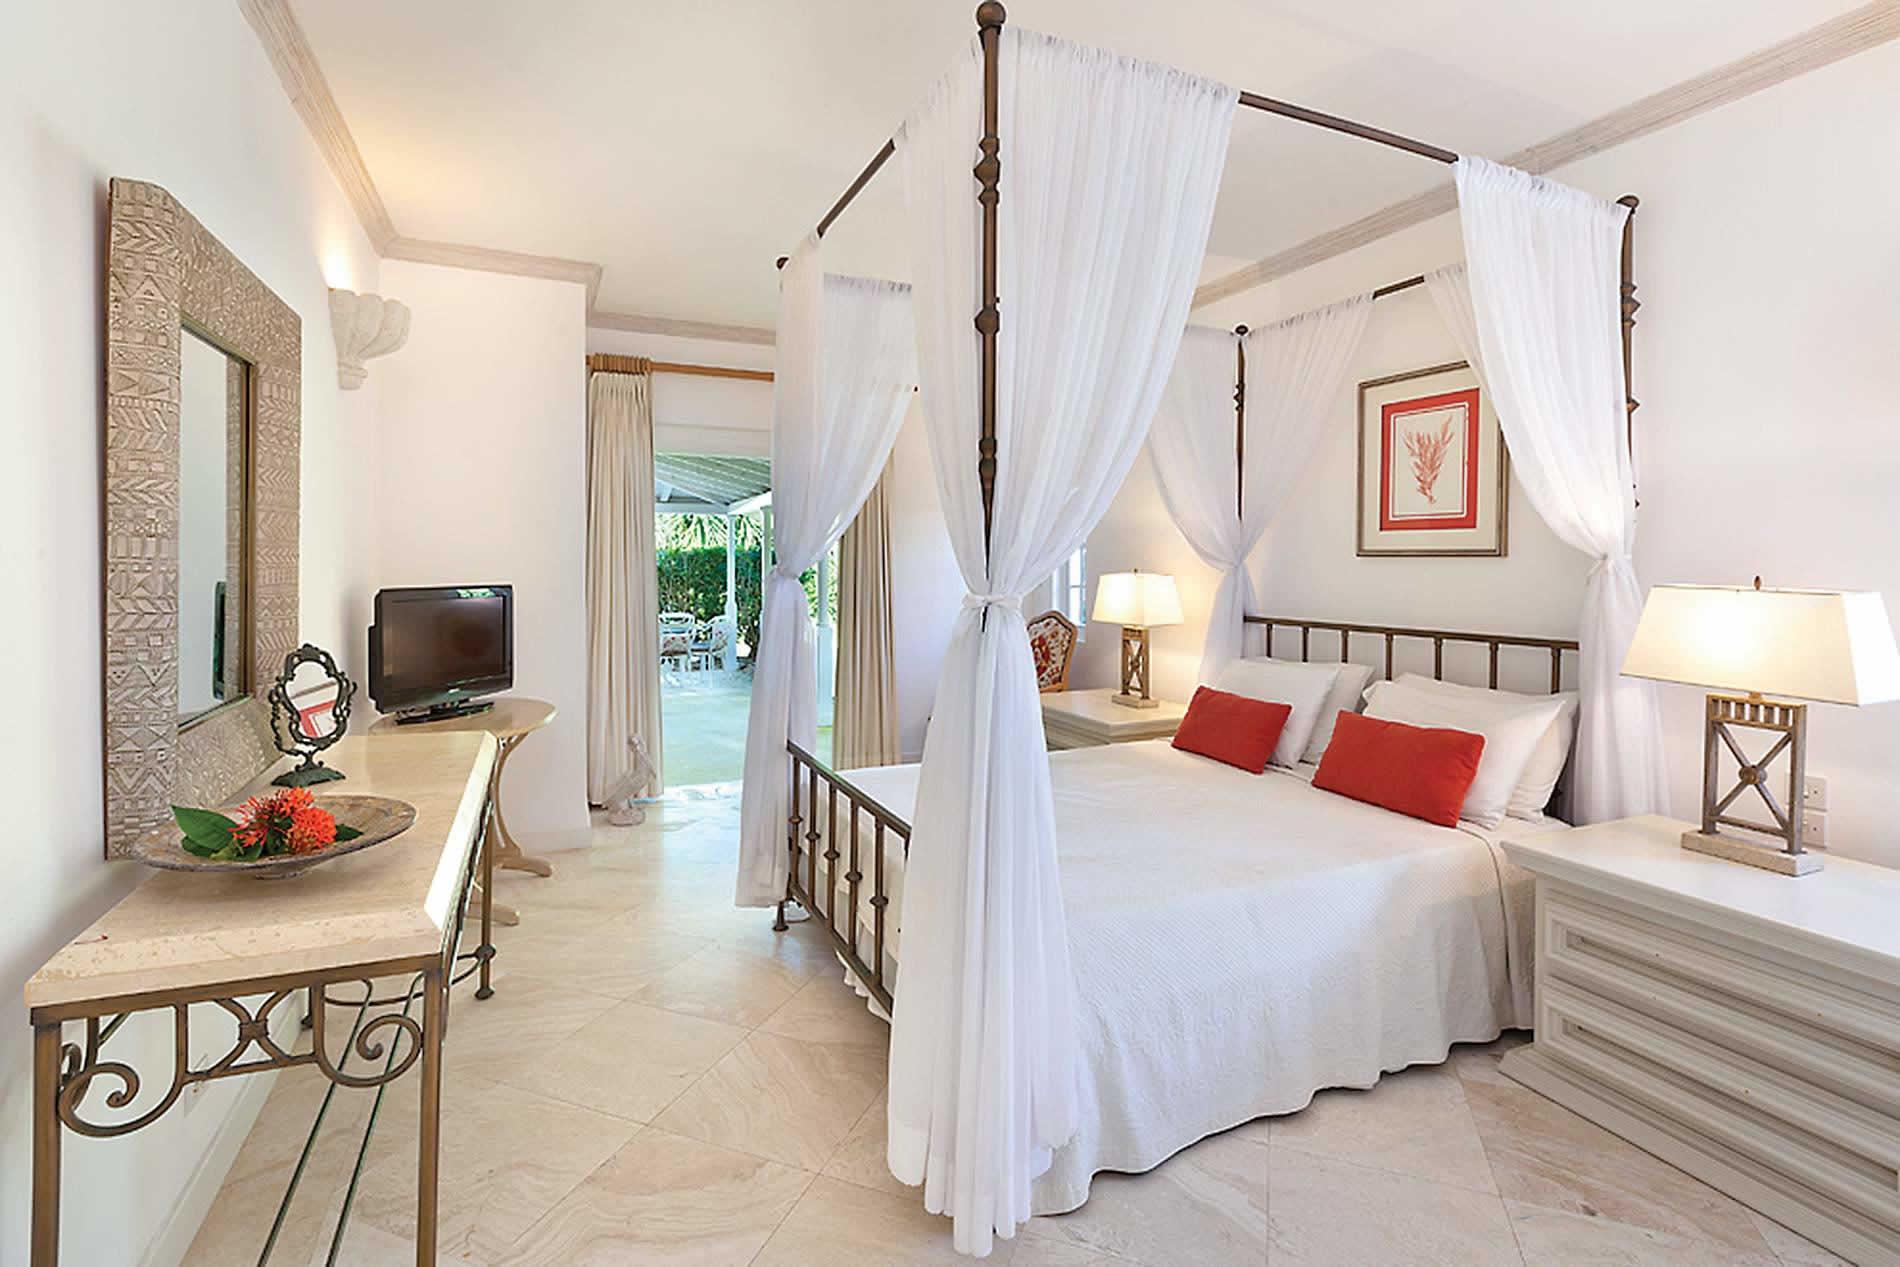 Villa Coconut Grove in Royal Westmoreland - sleeps 8 people